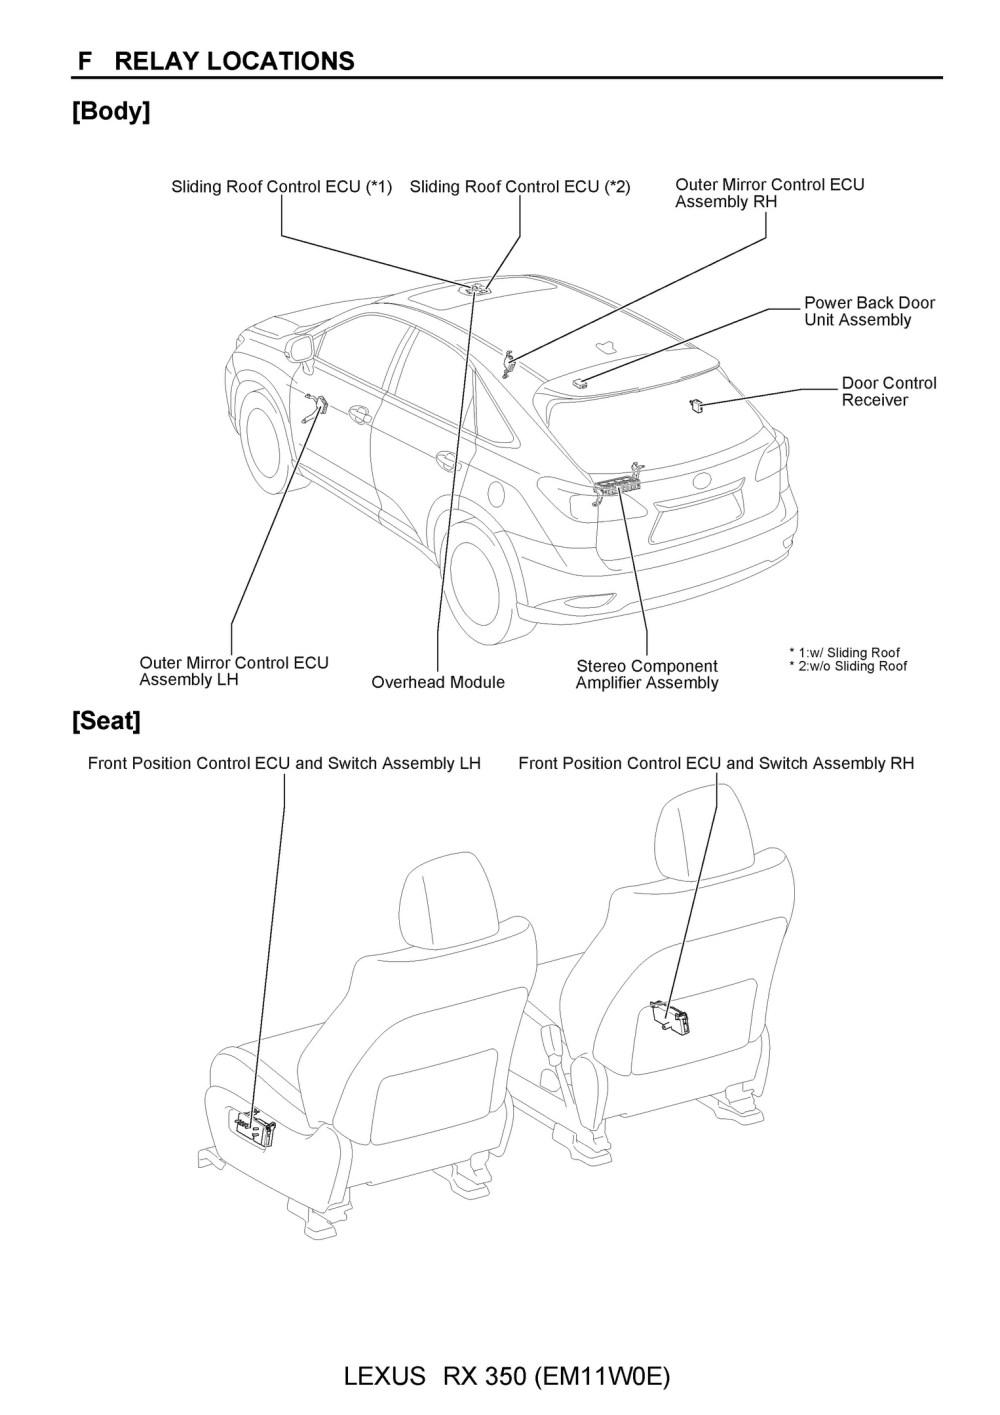 medium resolution of free 2010 lexus rx350 oem electrical wiring diagram oem auto lexus rx 350 radio wiring diagram lexus rx350 wiring diagram